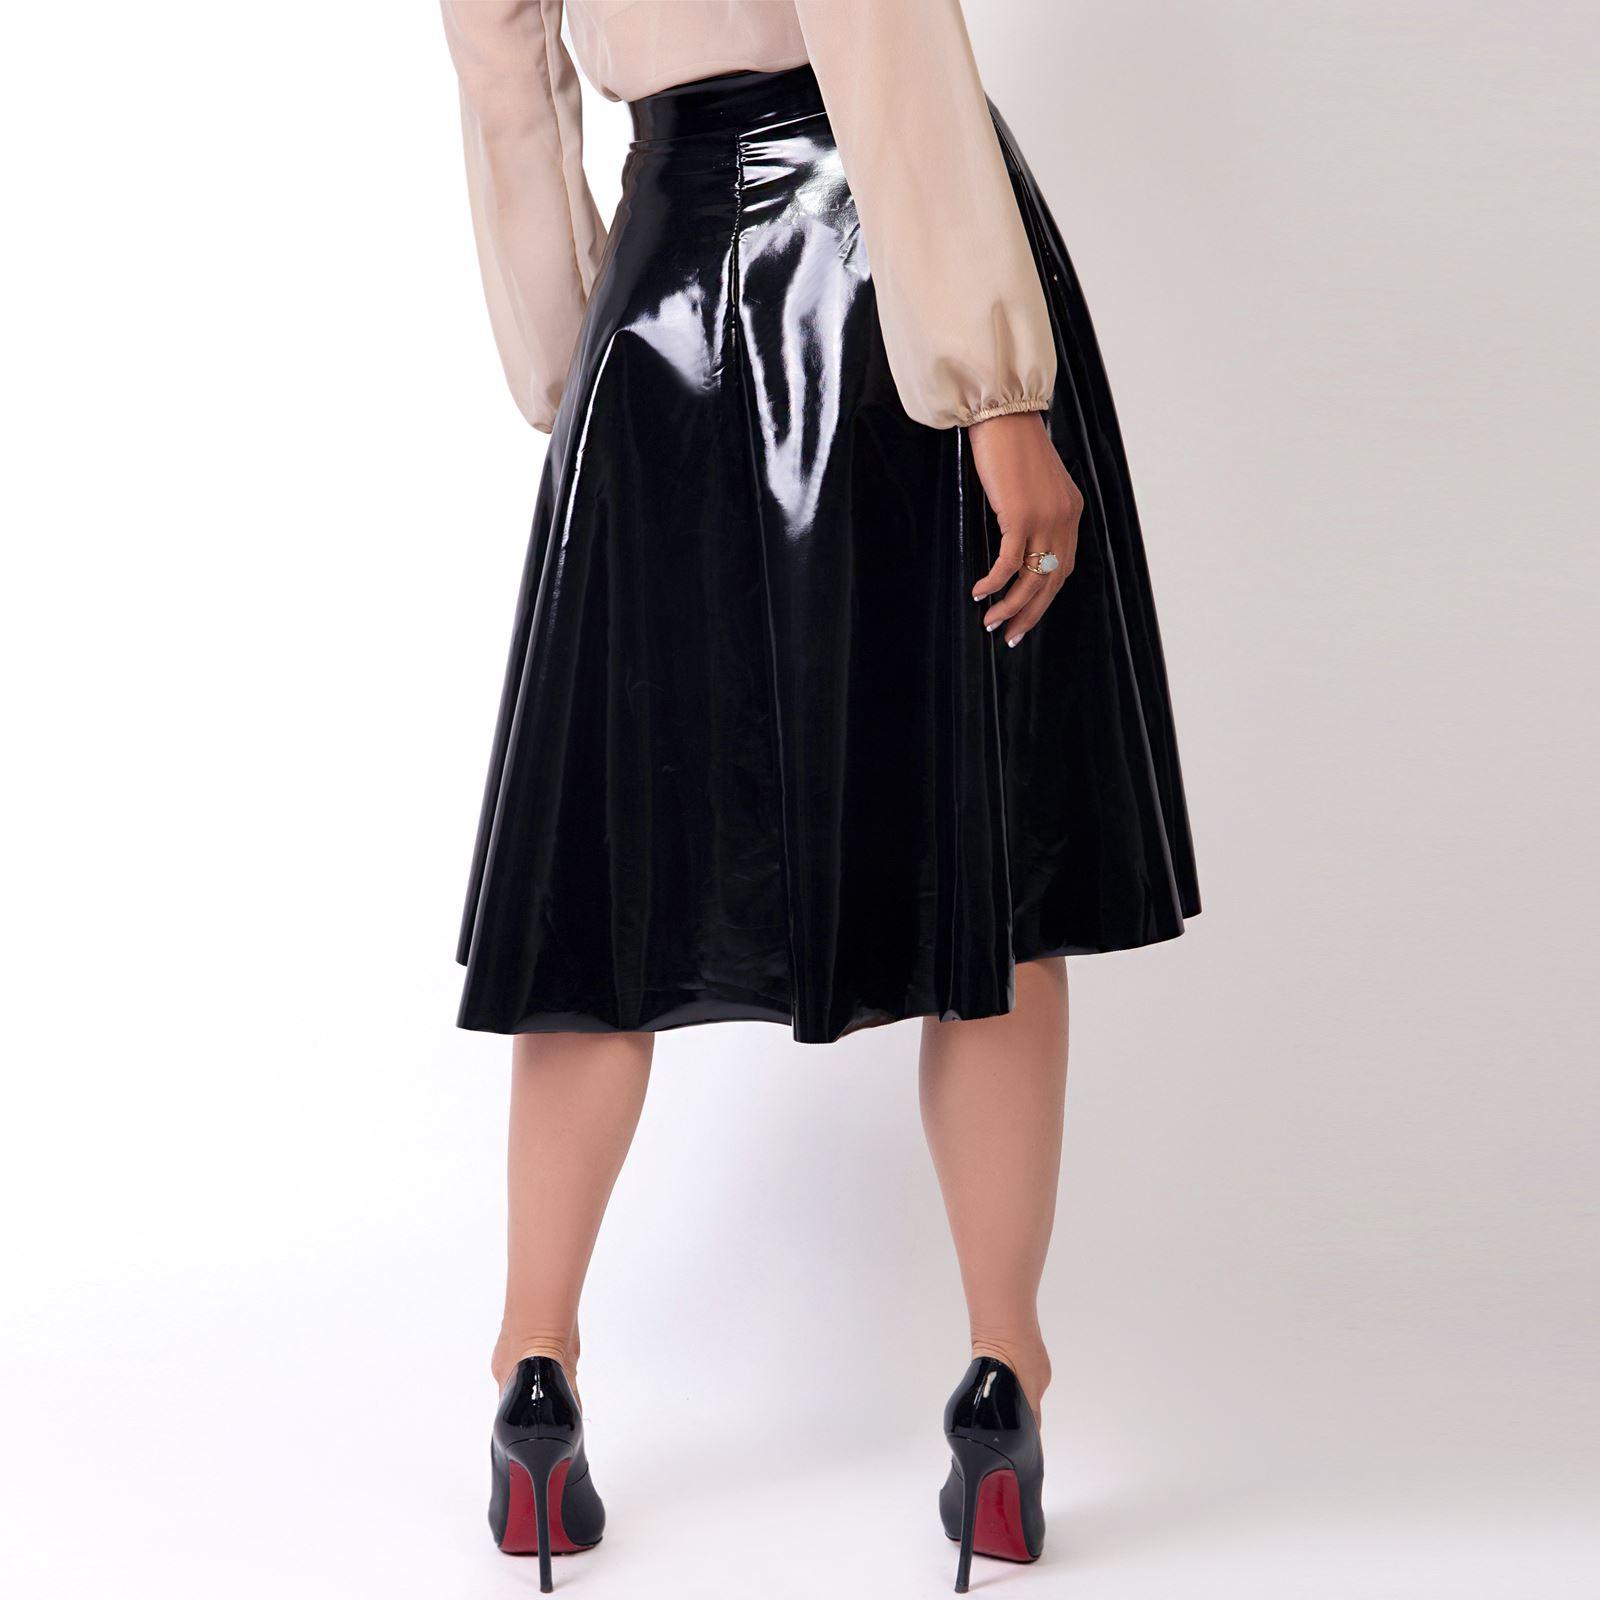 Womens-Ladies-PVC-Leather-Skirt-Pleated-Midi-Flared-A-Line-Full-Swing-High-Waist thumbnail 6